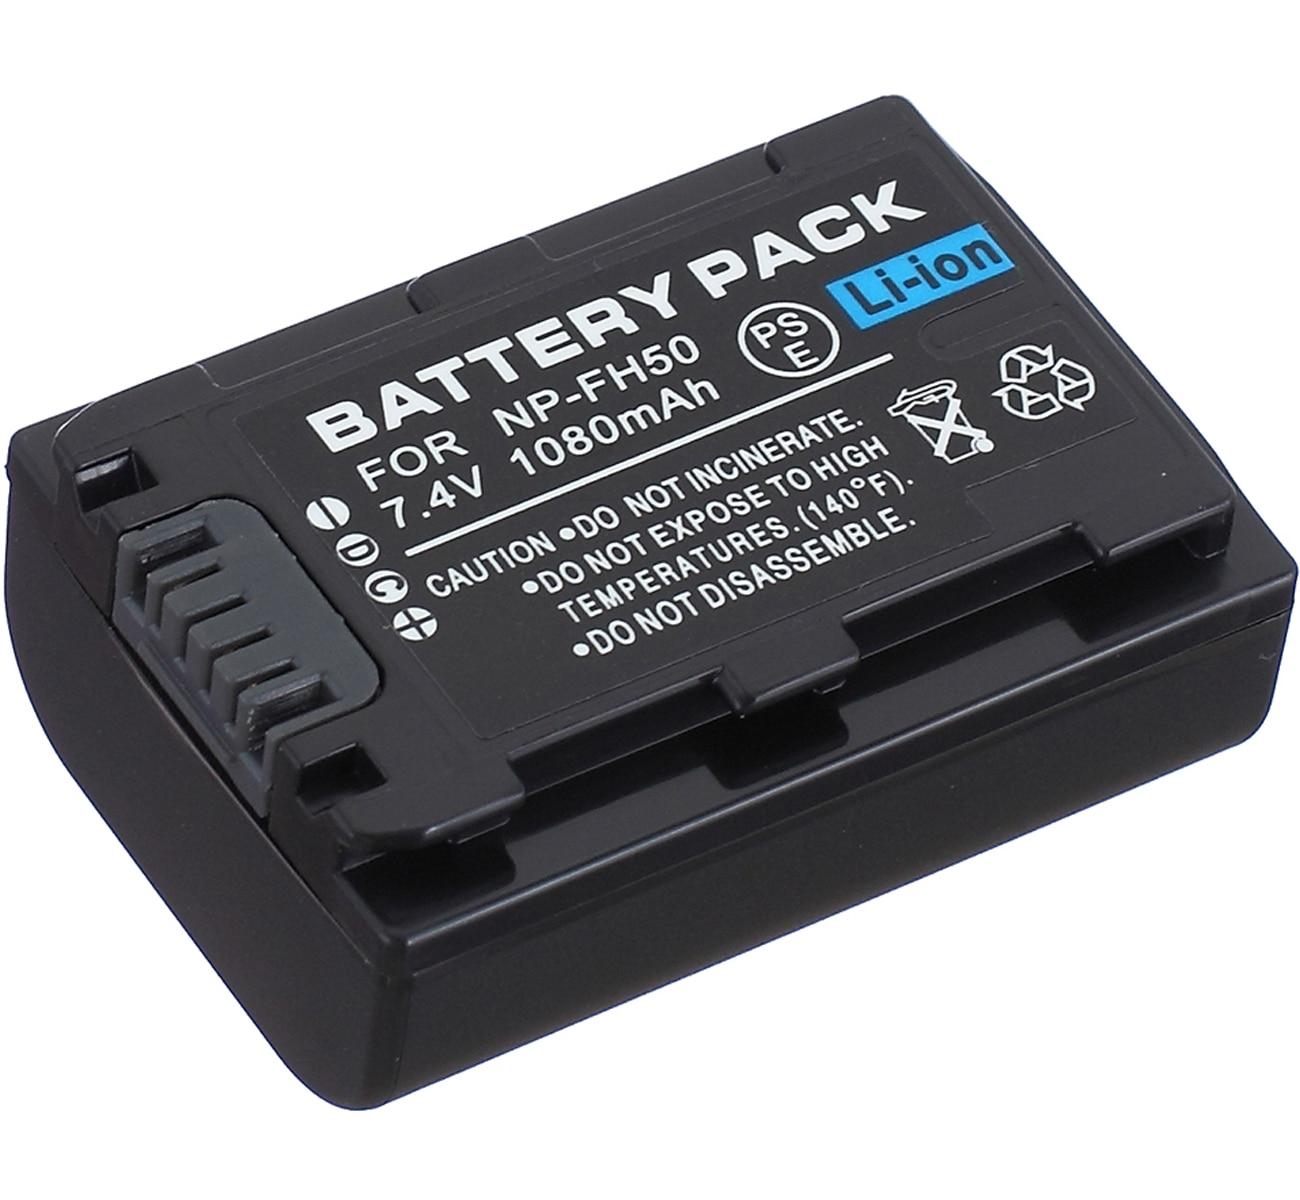 Paquete de batería para Sony HDR-SR5... HDR-SR7... HDR-SR8... HDR-SR10... HDR-SR11... HDR-SR12 Cámaras...